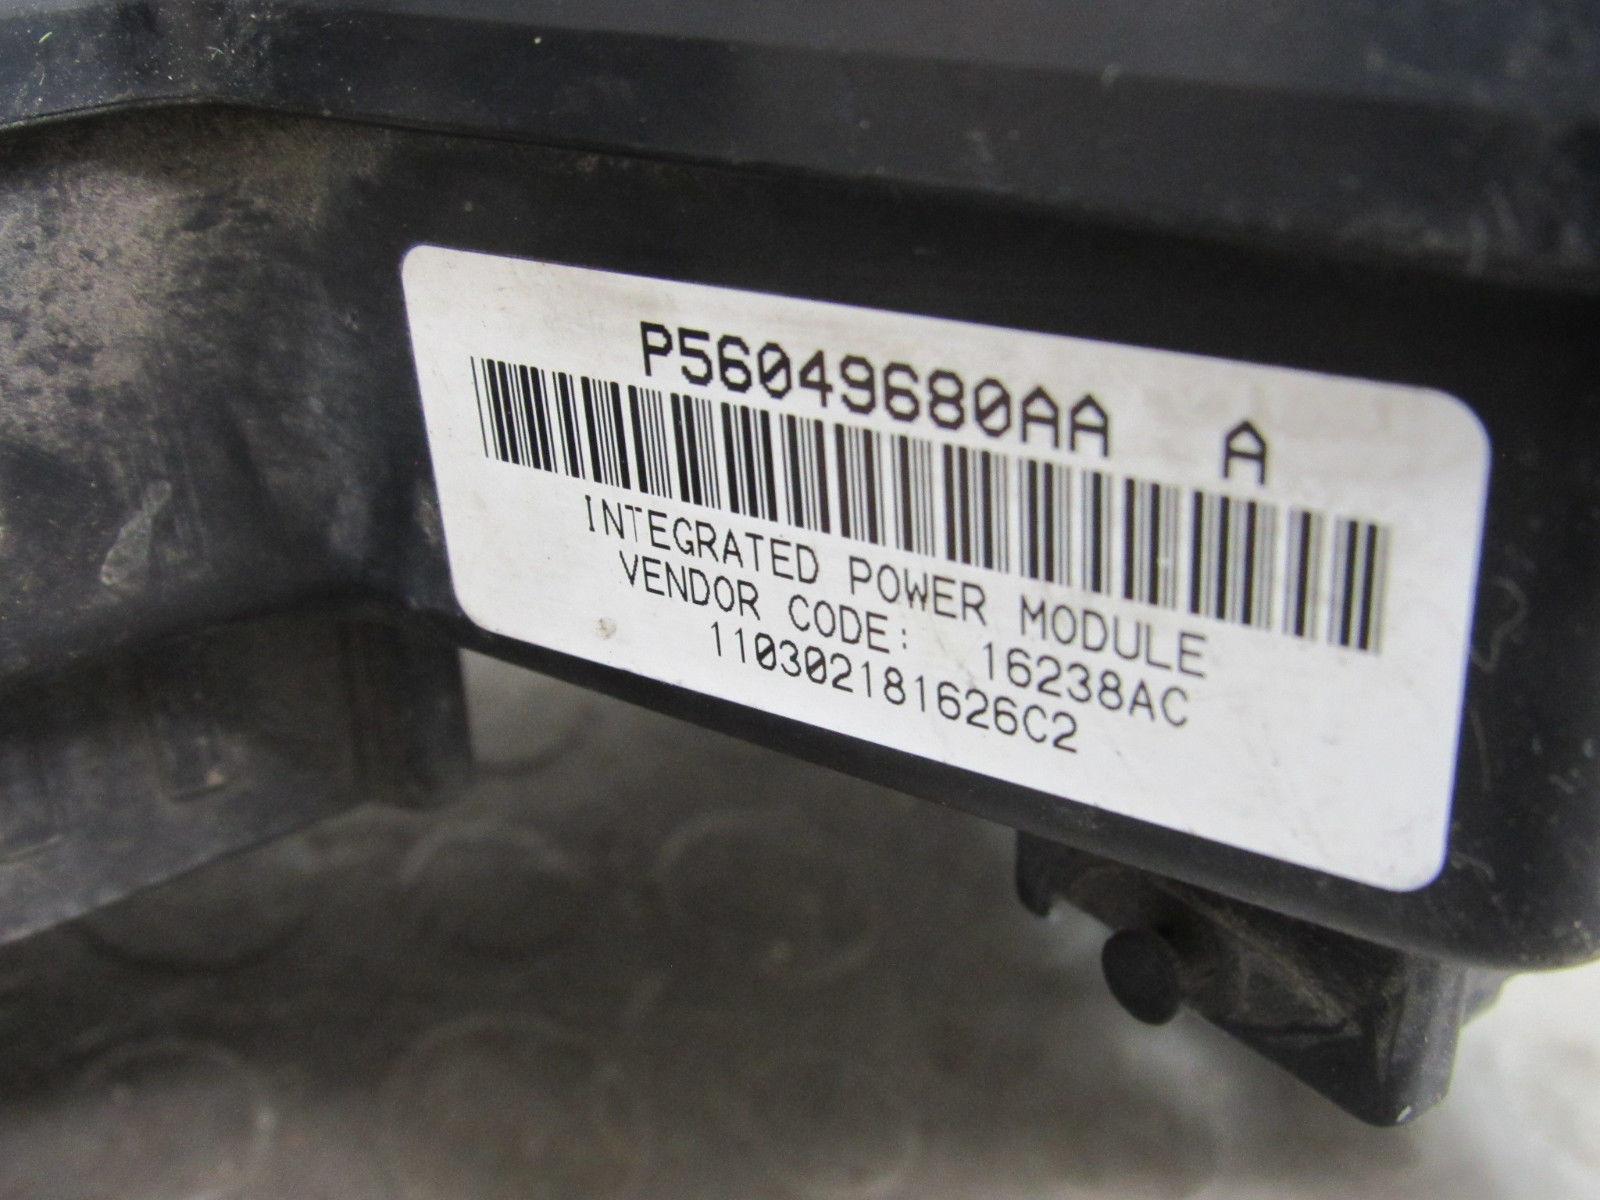 02-03 dodge ram truck integrated power module fuse box block 56049680aa dc